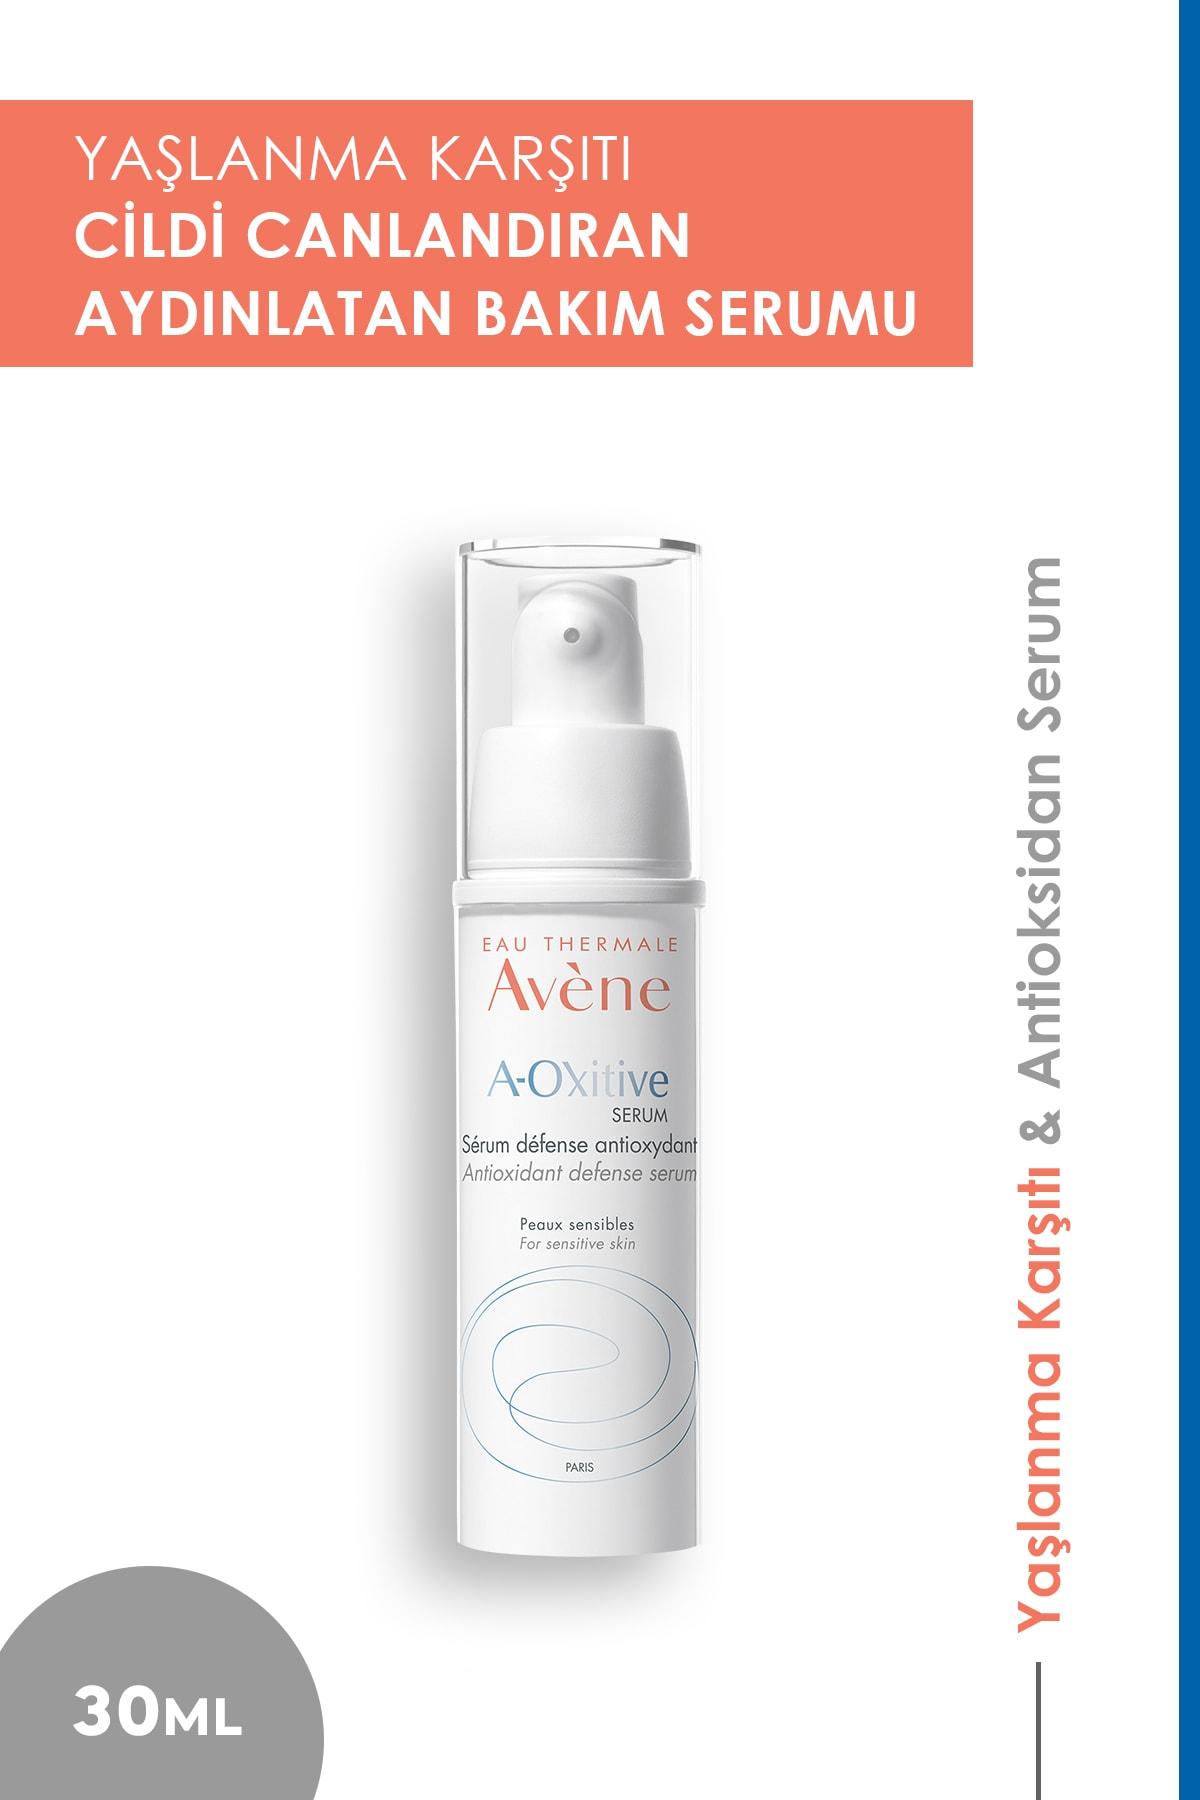 Avene A-oxitive Yaşlanma Karşıtı Serum 30 ml Ave208177 1